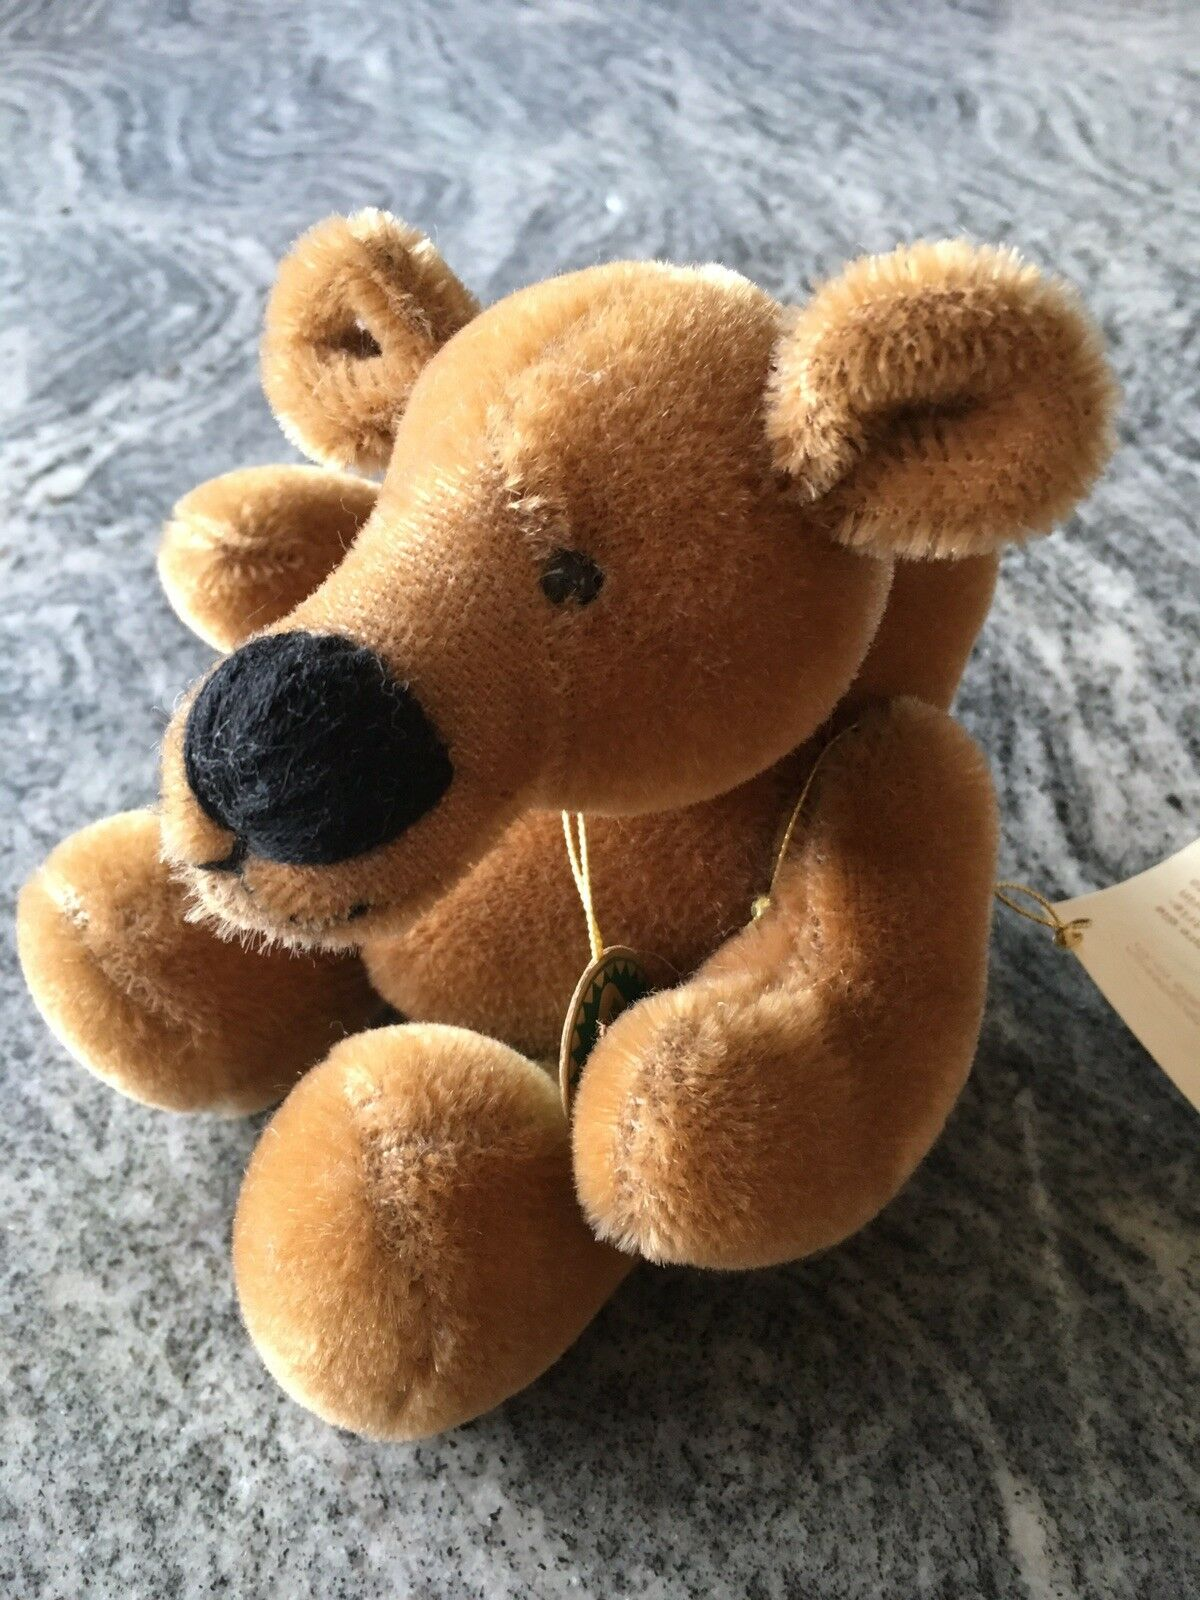 Hermann Bär Teddy Teddy Teddy Wunibald Annette Rauch Limitiert 373 500 af87d8